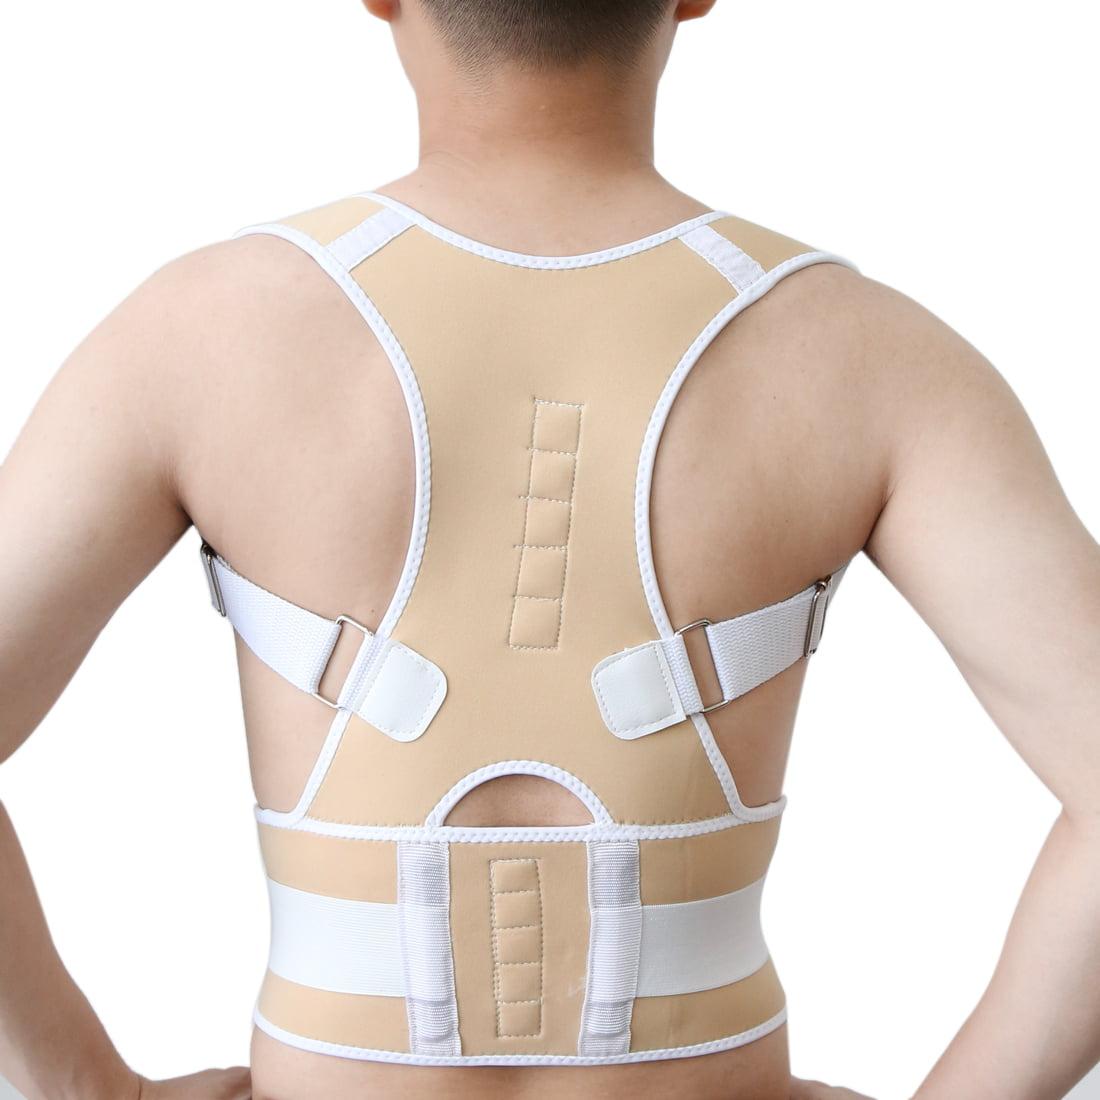 Fully Adjustable Brace Belt Band for Posture Correction Back Pain Support